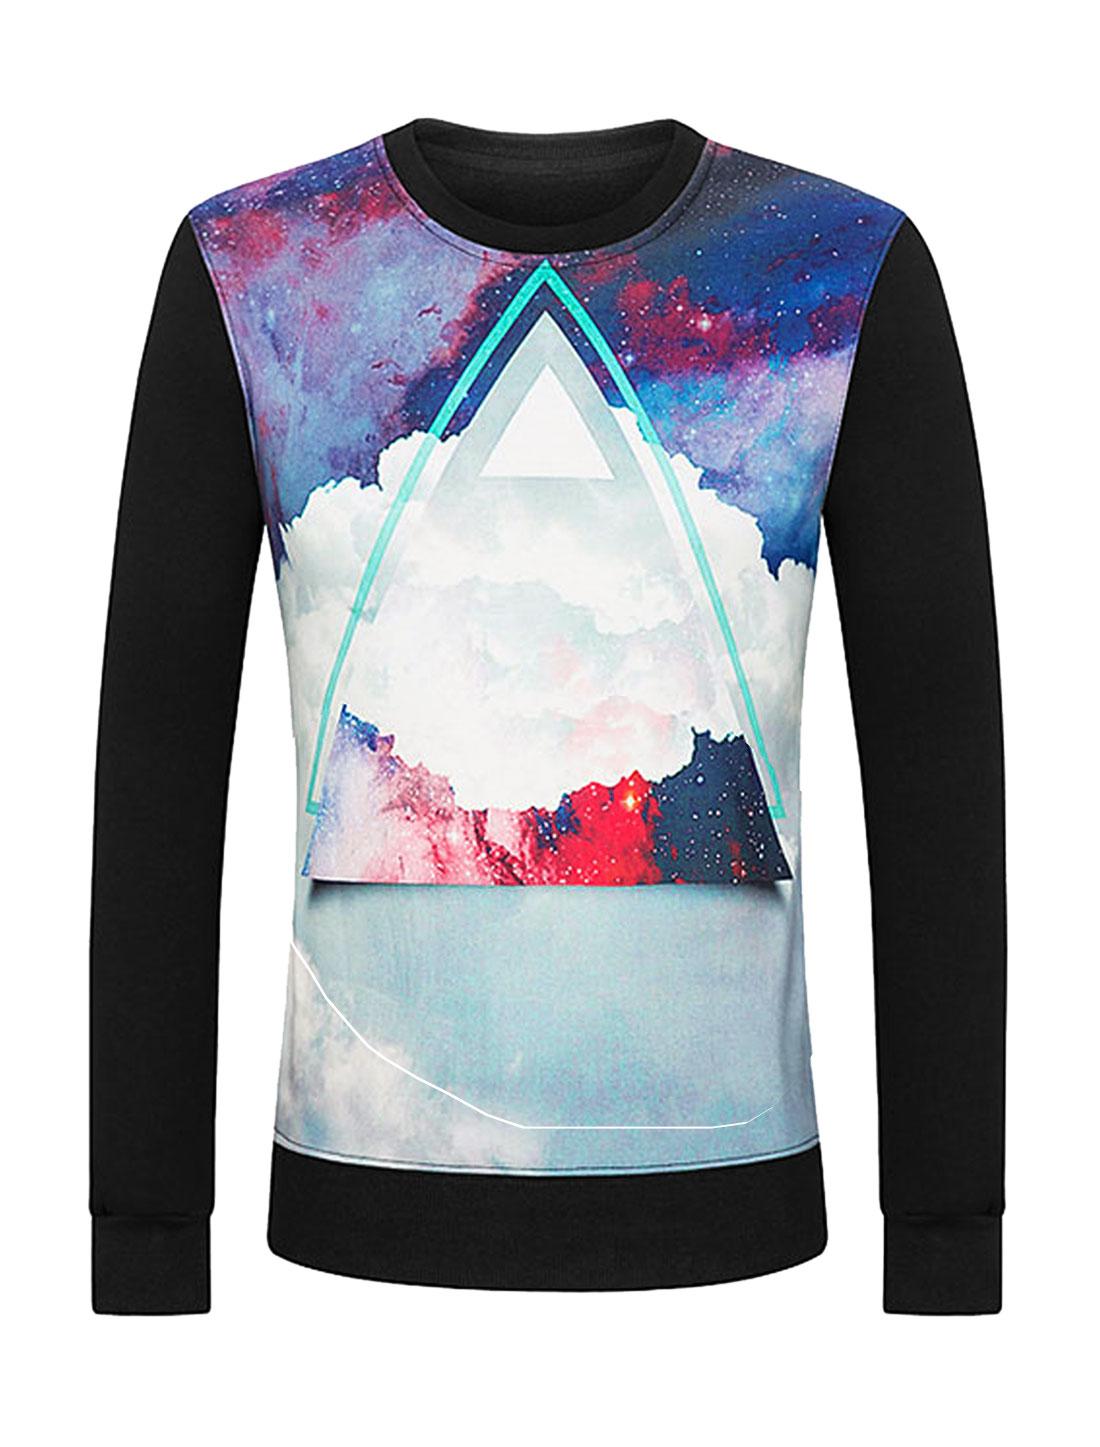 Men Galaxy Geometric Soft Lined Slim Fit Sweatshirt Black M